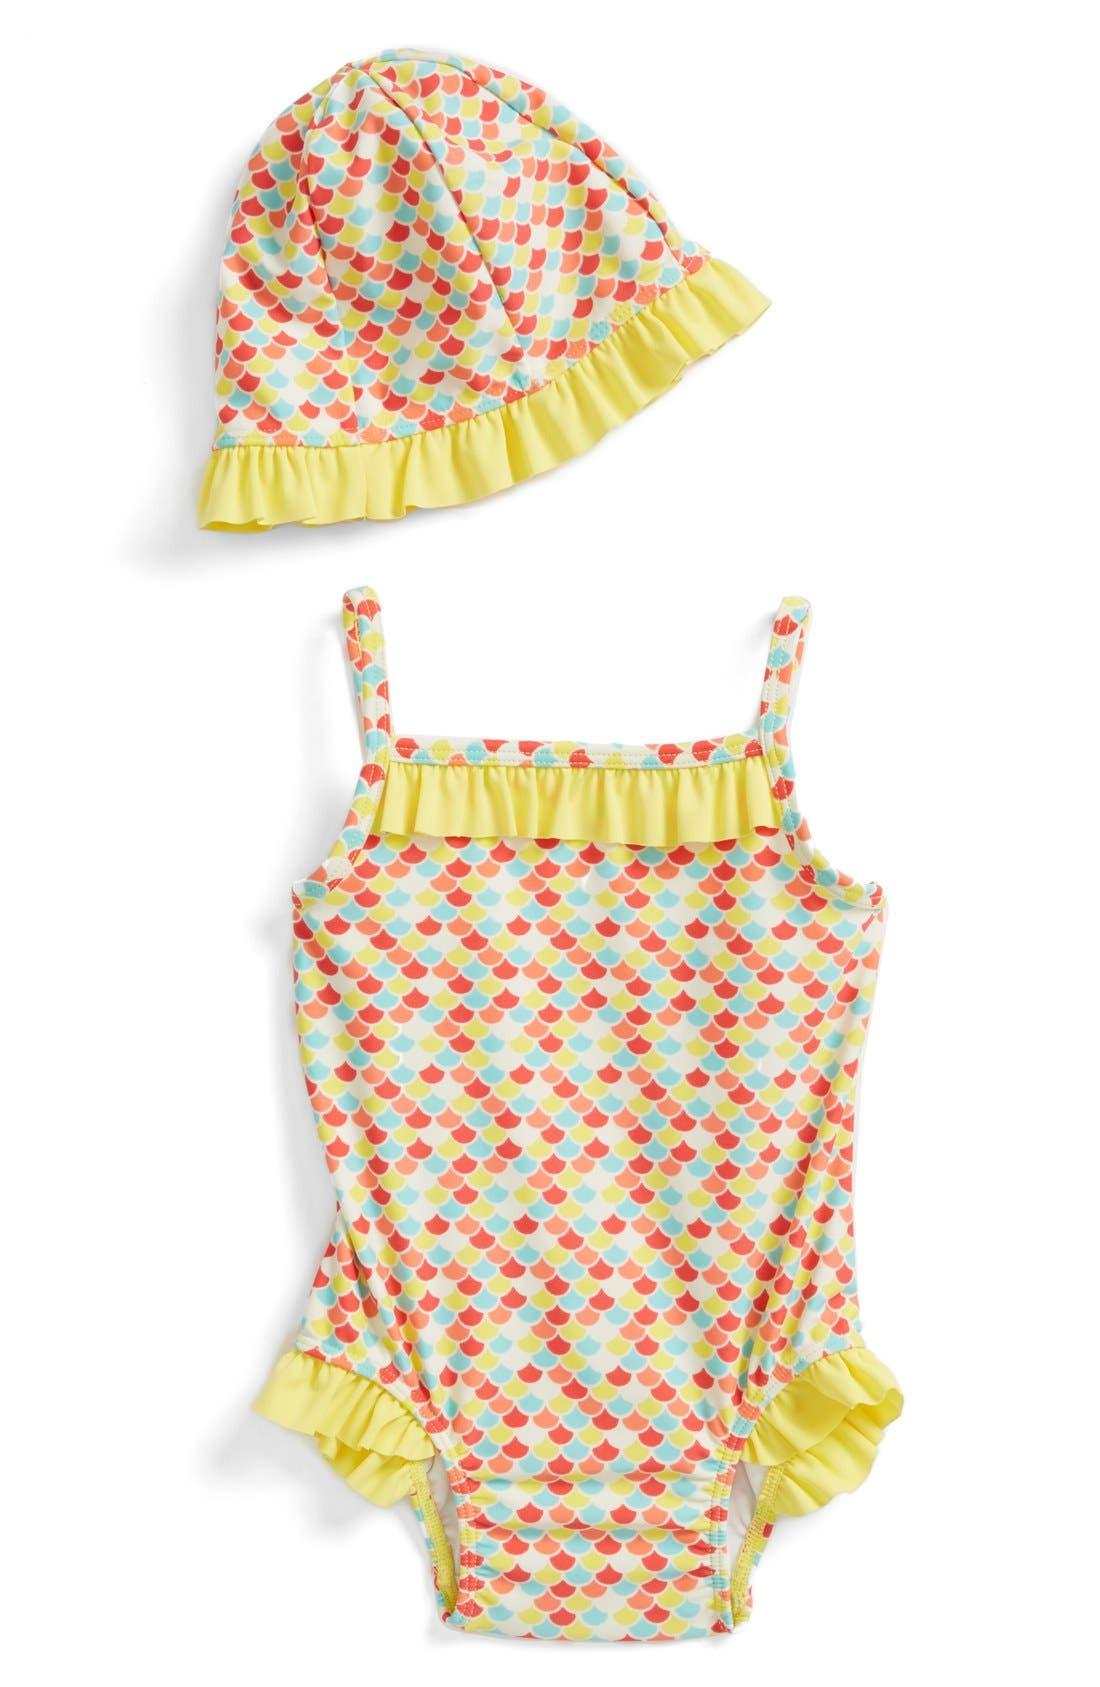 Alternate Image 1 Selected - Tucker + Tate Ruffle One-Piece Swimsuit & Hat (Baby Girls)